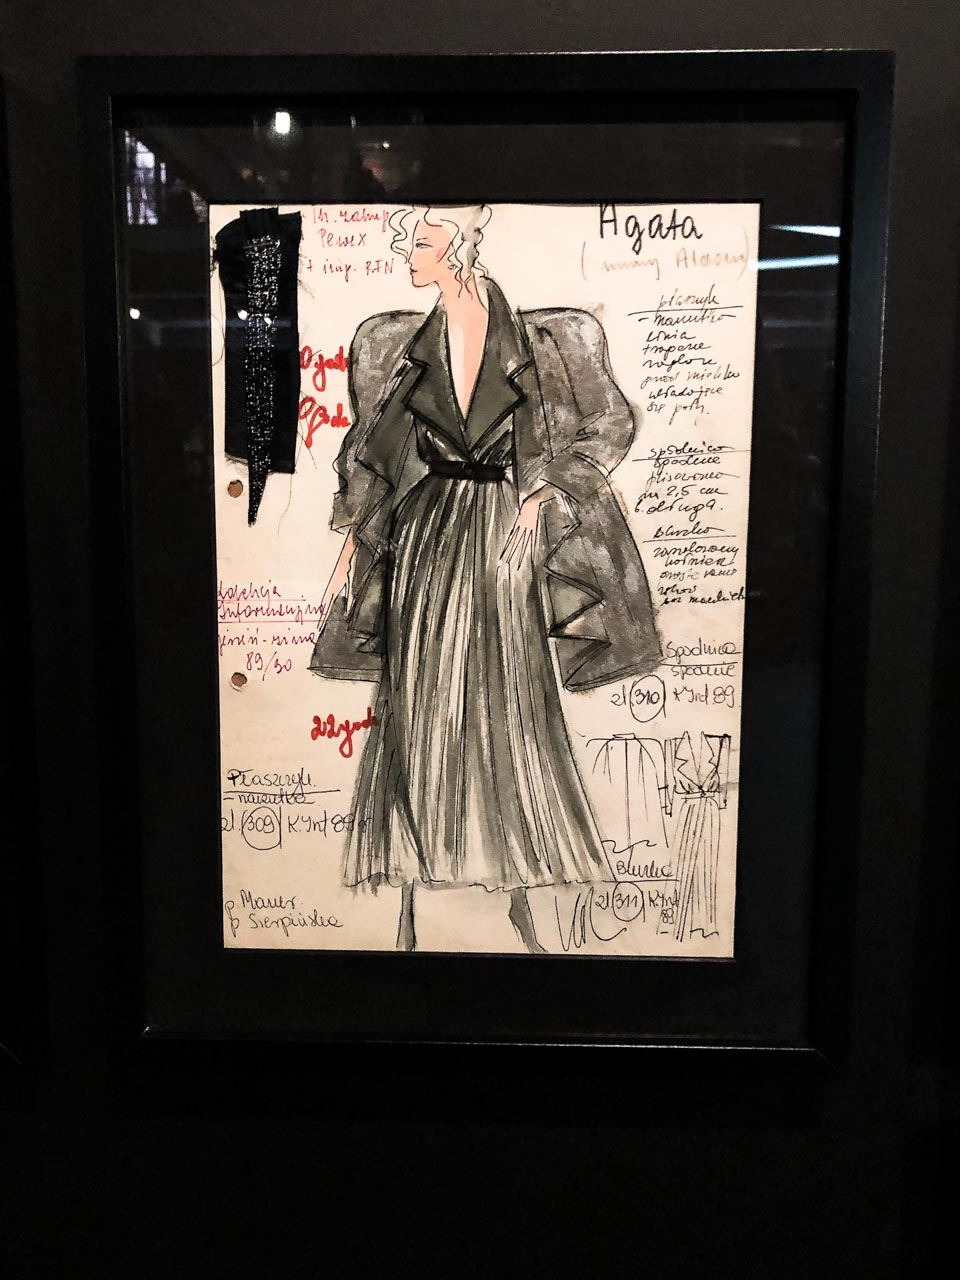 A fashion sketch of Moda Polska at The Central Museum of Textiles in Łódź, Poland